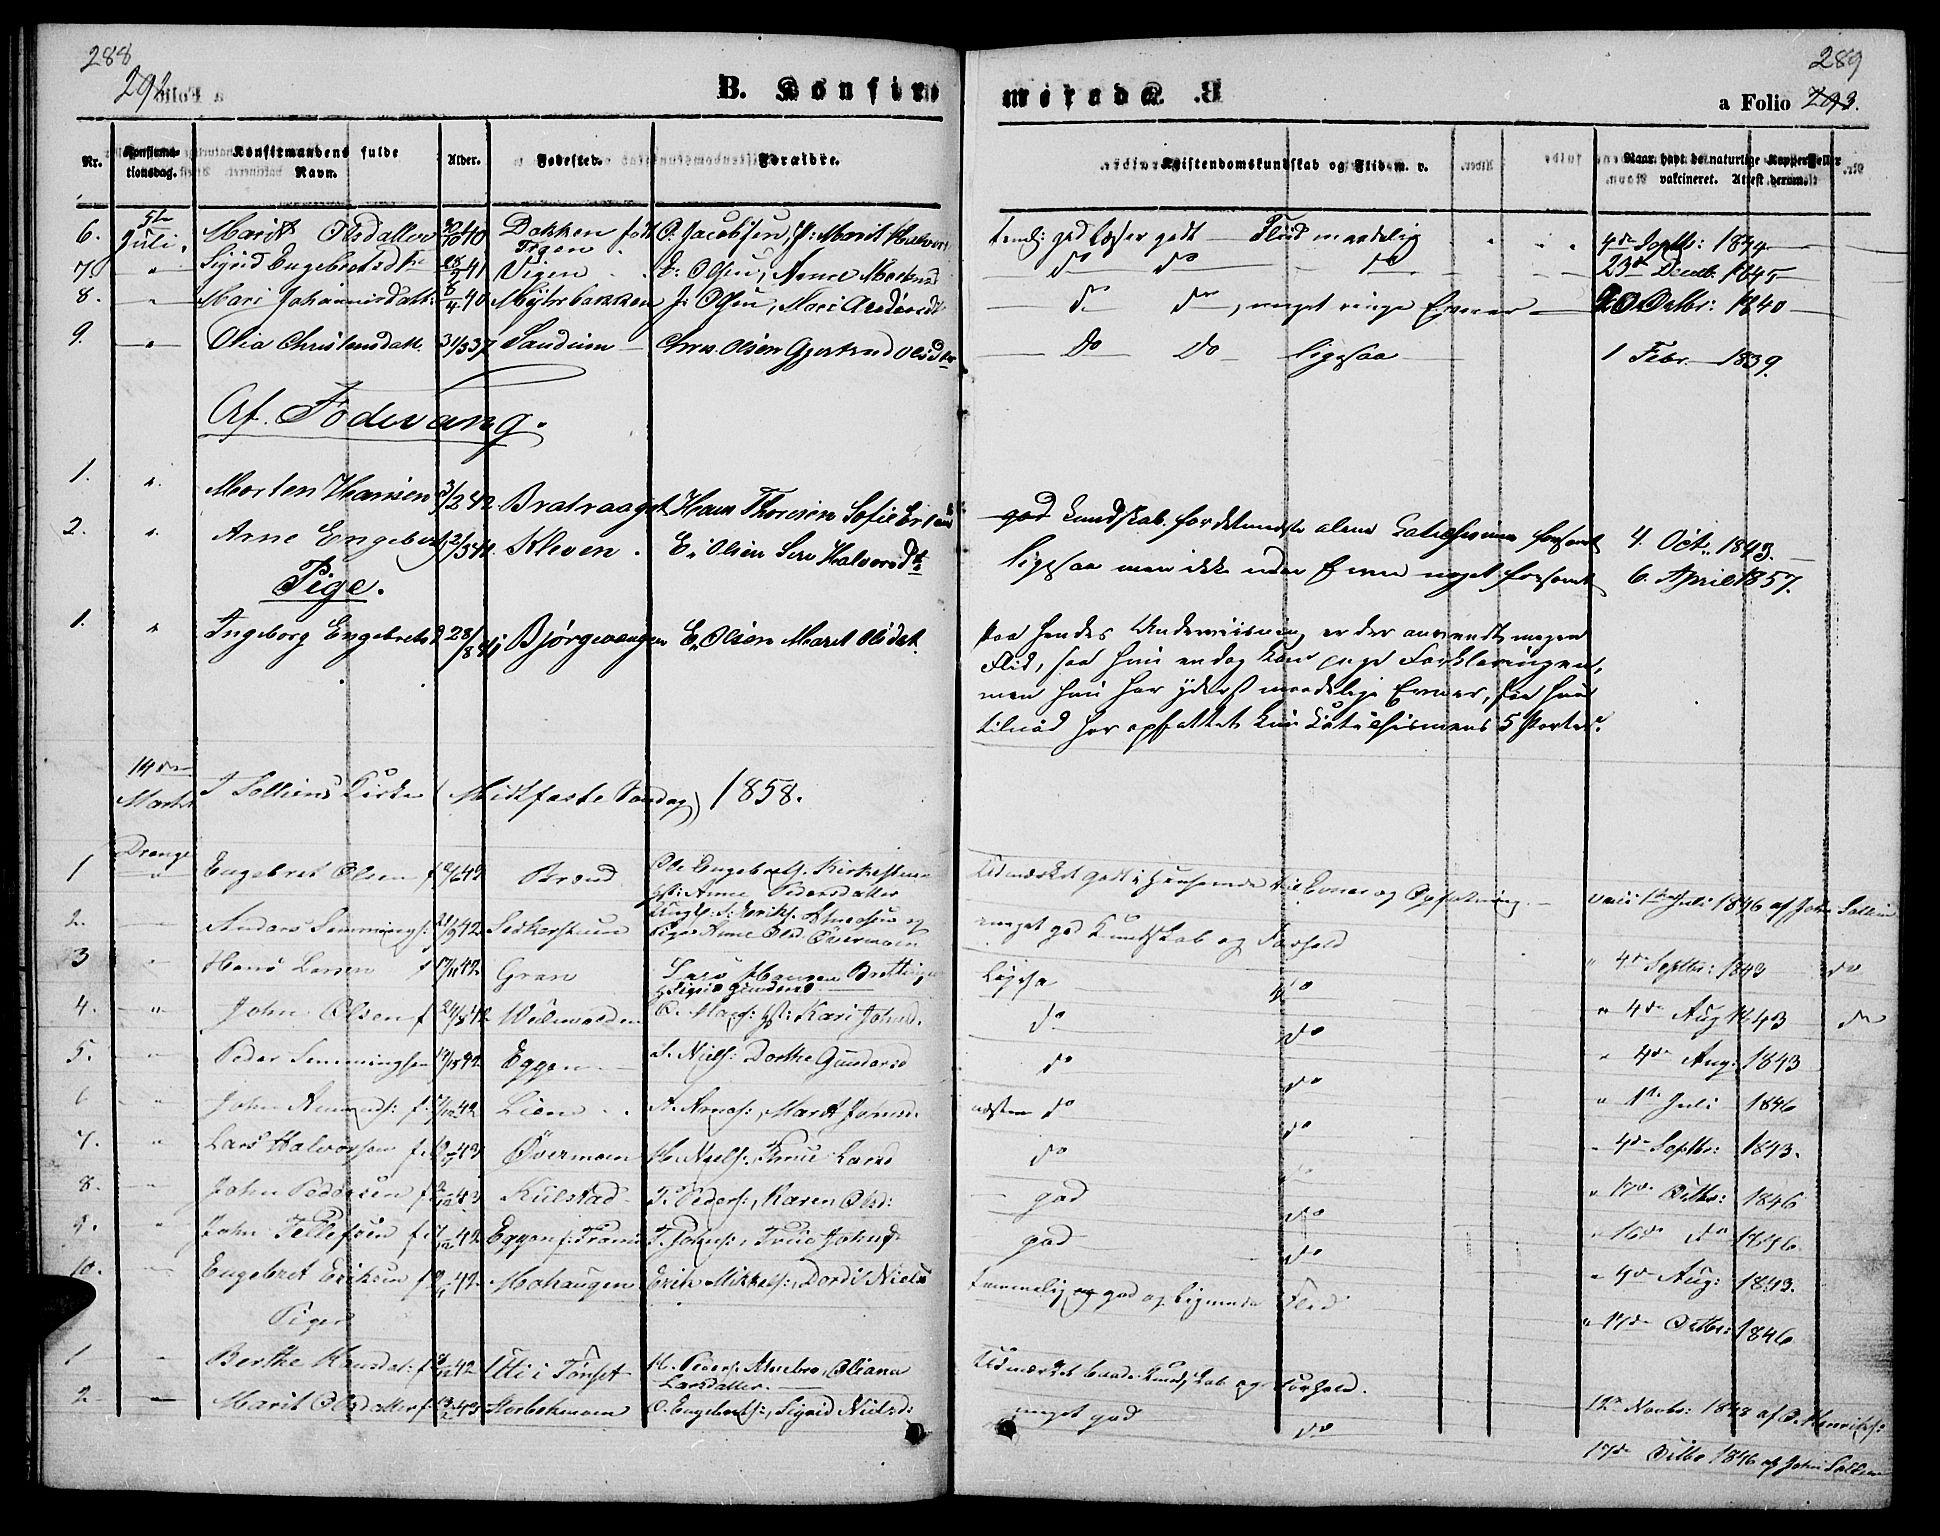 SAH, Ringebu prestekontor, Klokkerbok nr. 3, 1854-1866, s. 288-289